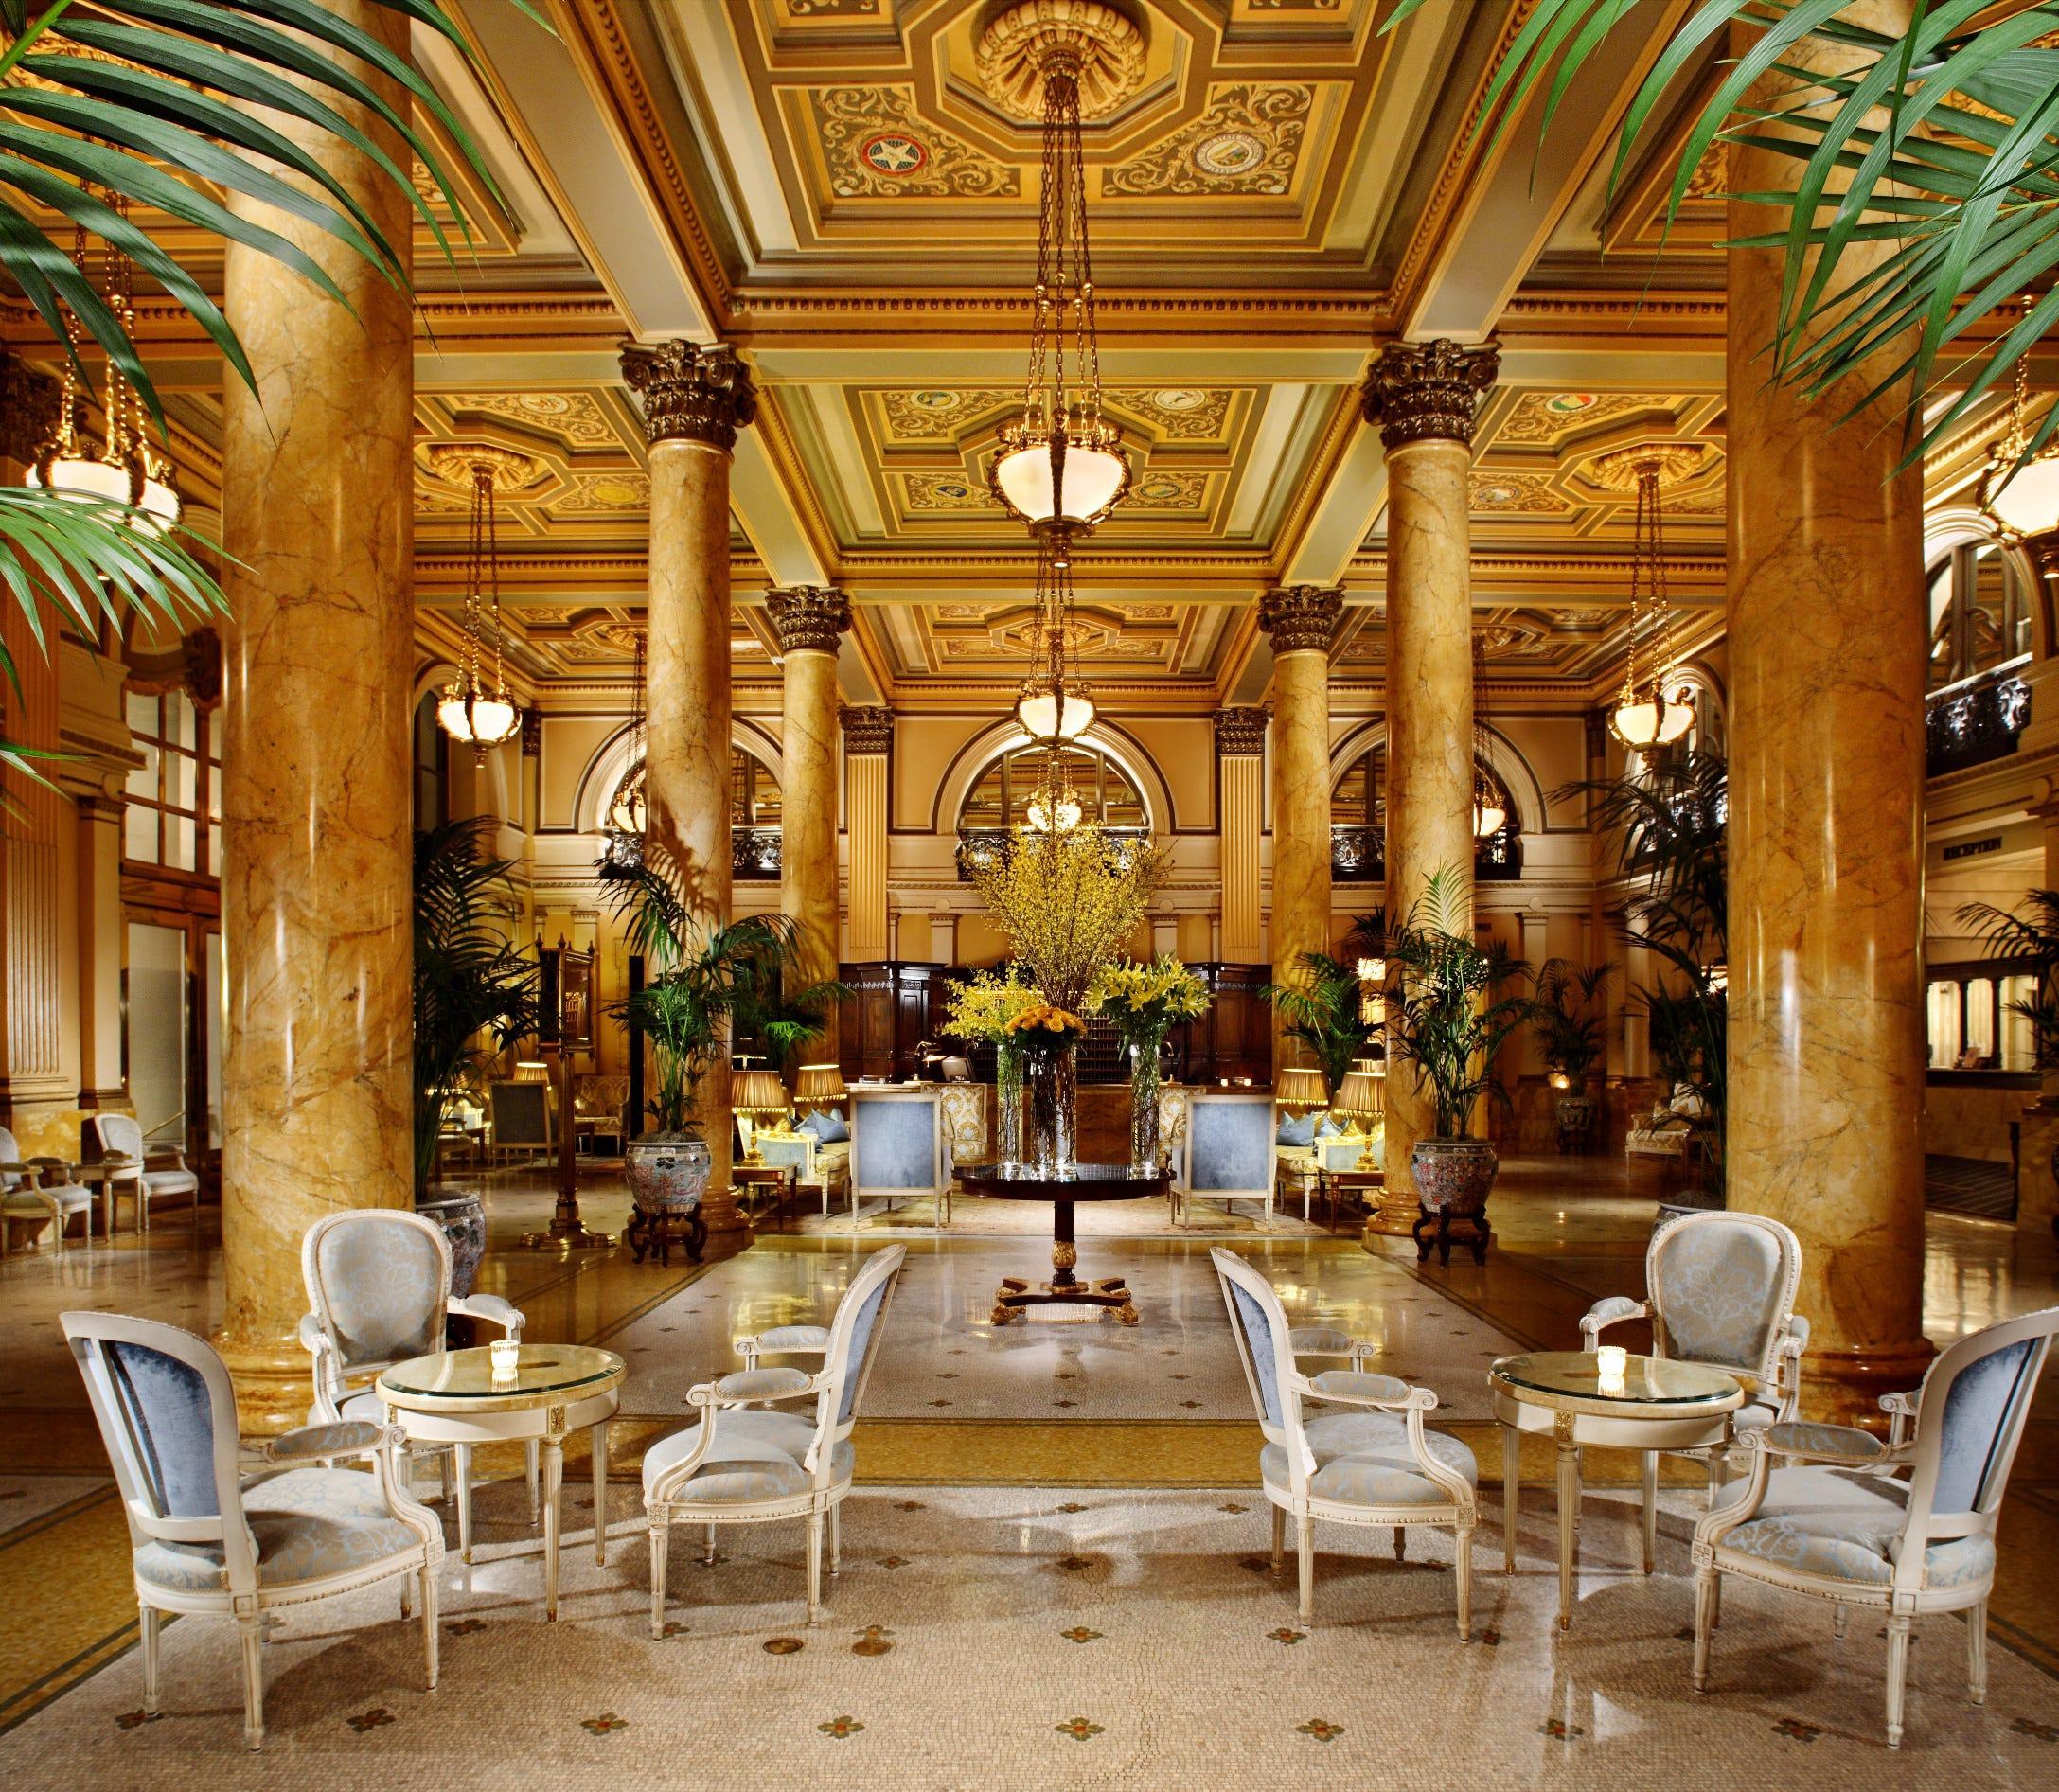 The lobby of the Willard Hotel in Washington, D.C., has a rich, spacious feel.